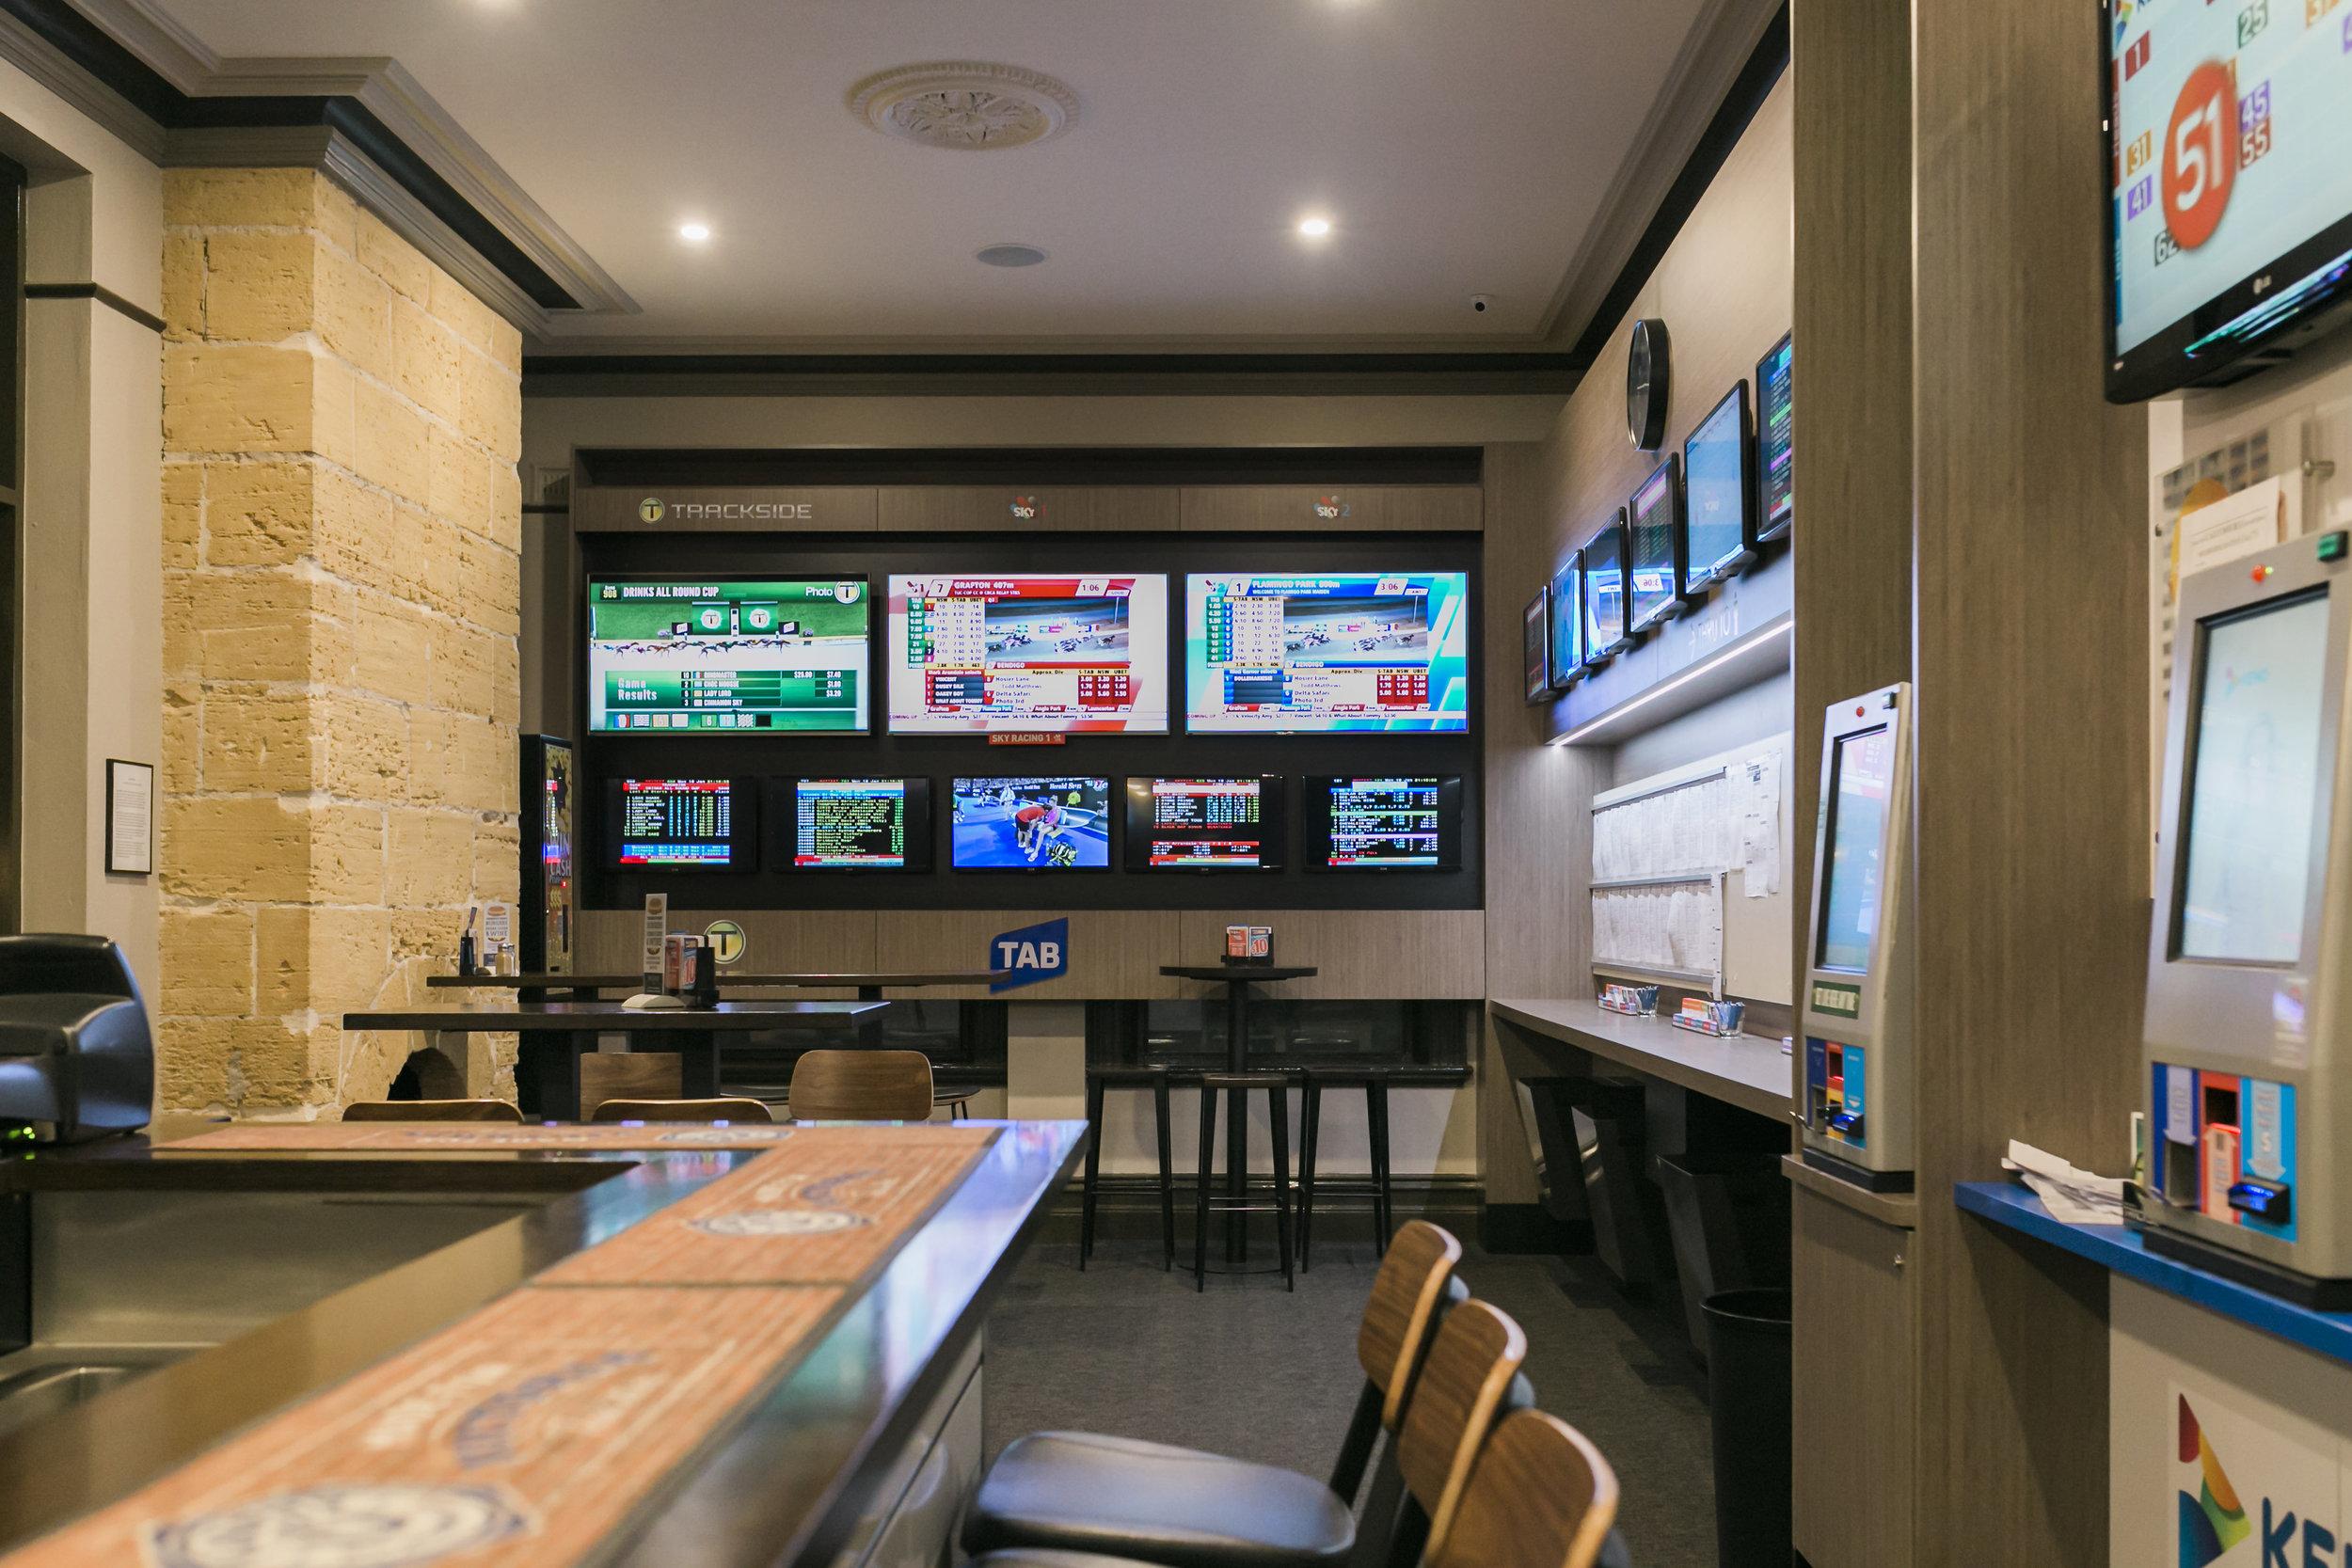 cally hotel warrnambool tab interior design 2 build.jpg